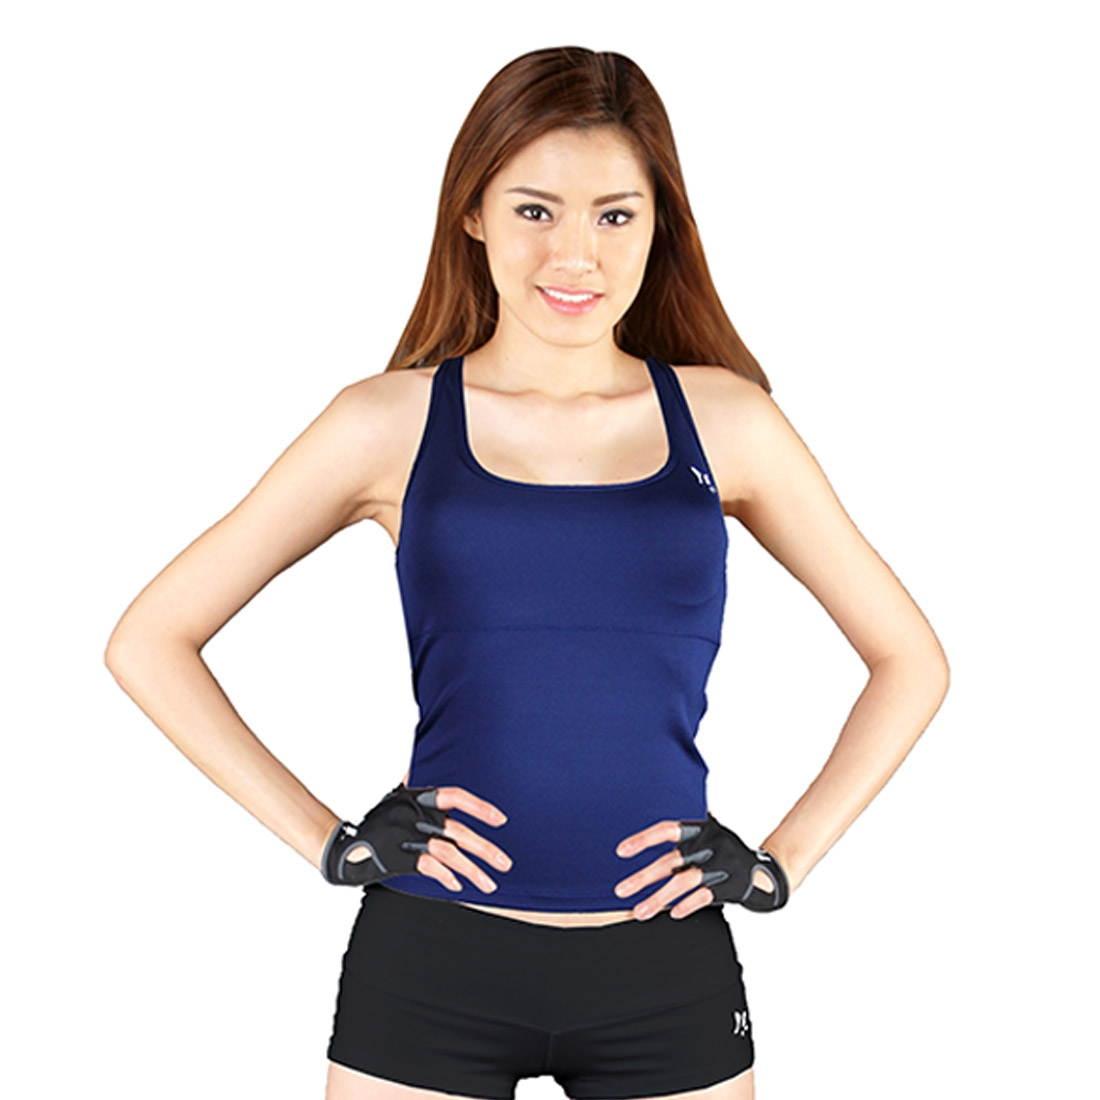 lasona women sportswear baju olahraga wanita brp 2484c e